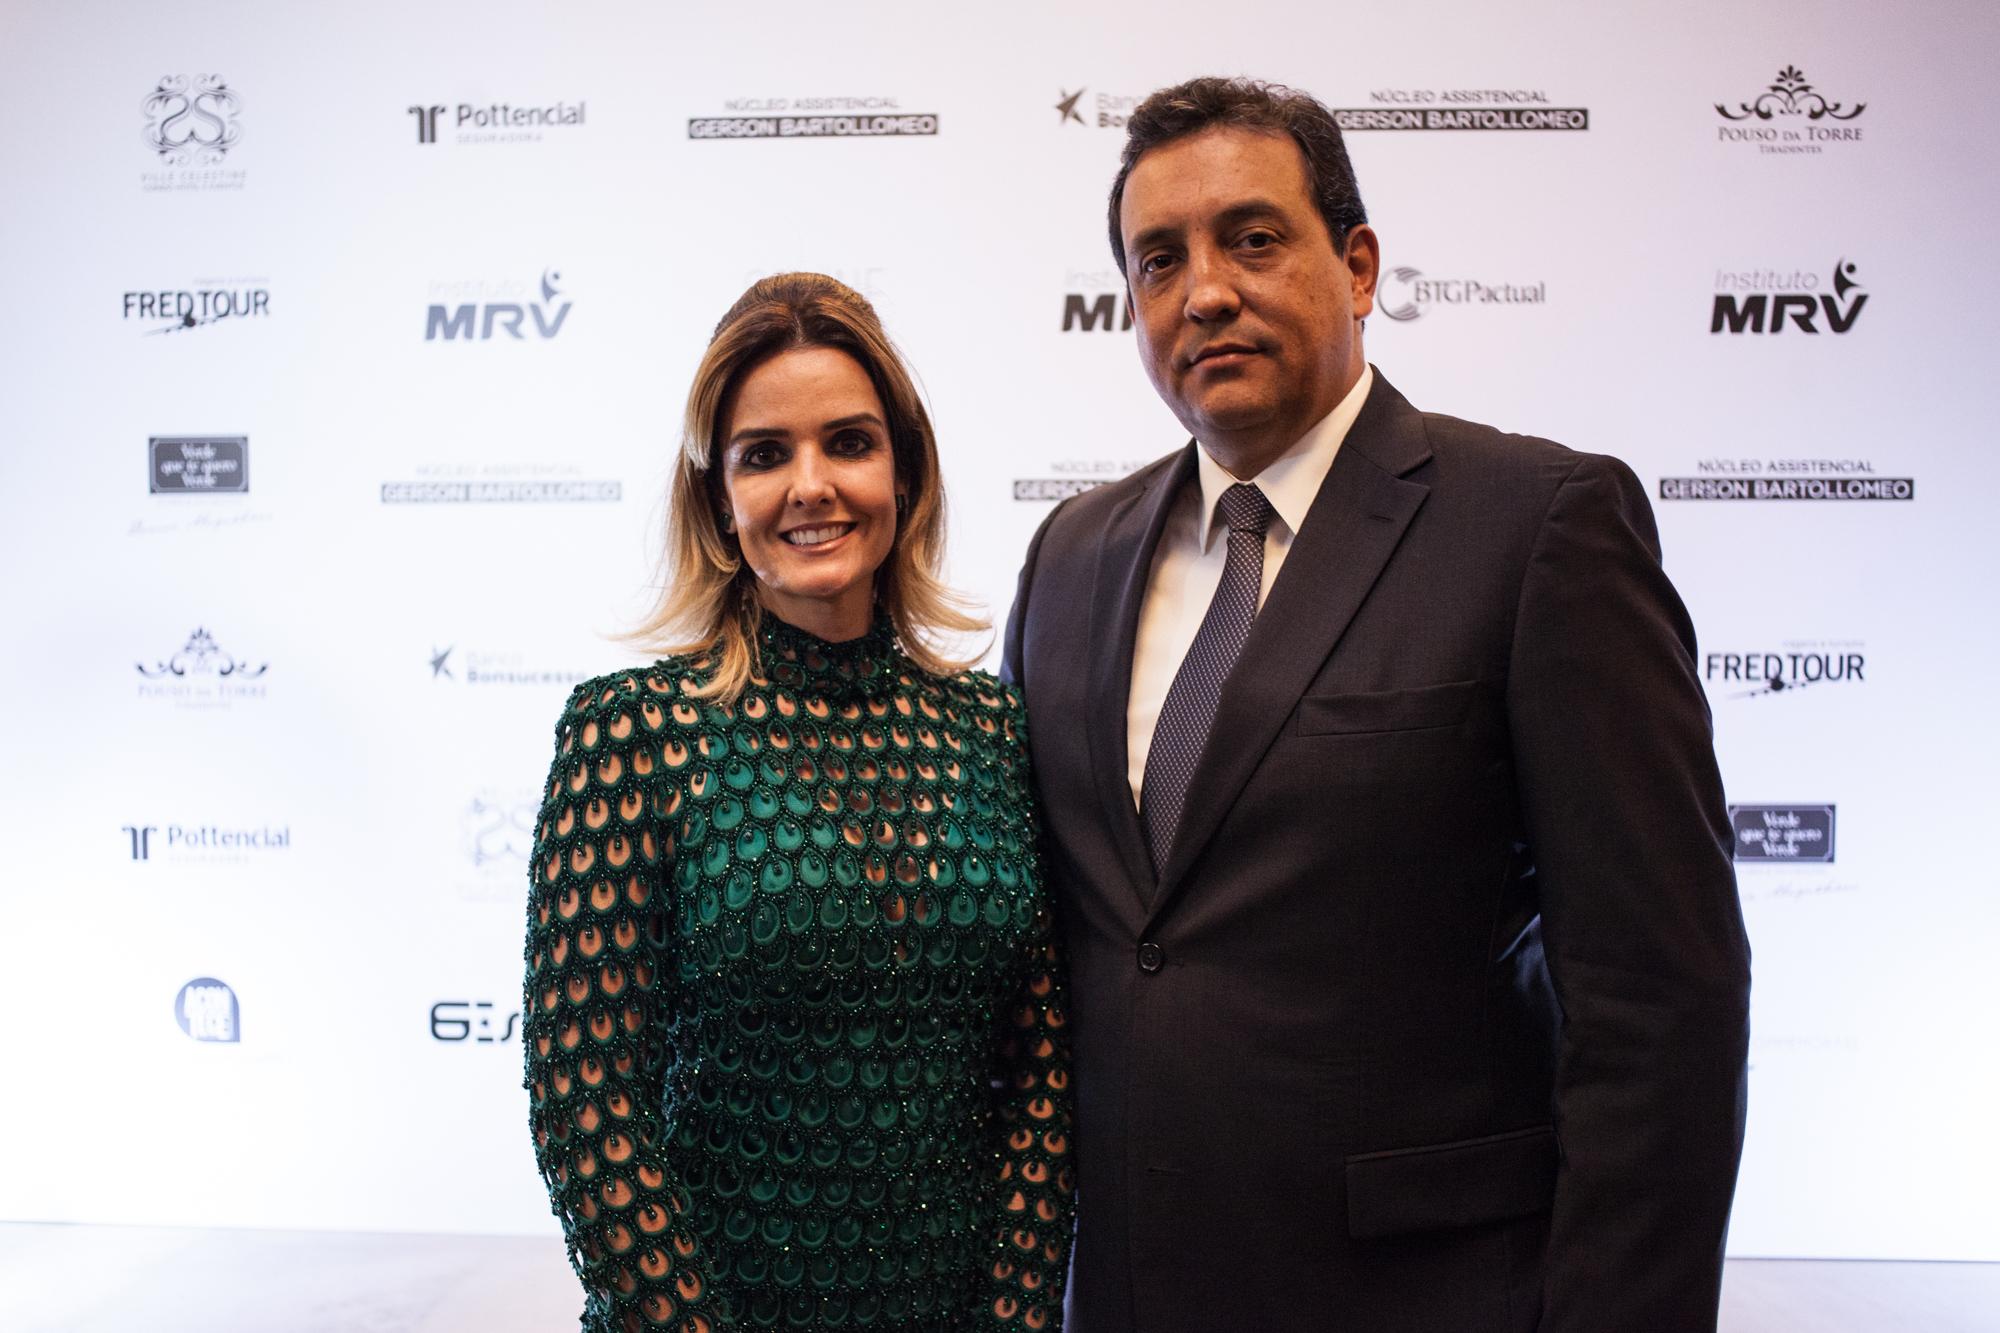 Juliana e Rafael Lafetá, Instituto MRV BrazilFoundation Belo Horizonte Minas Gerais